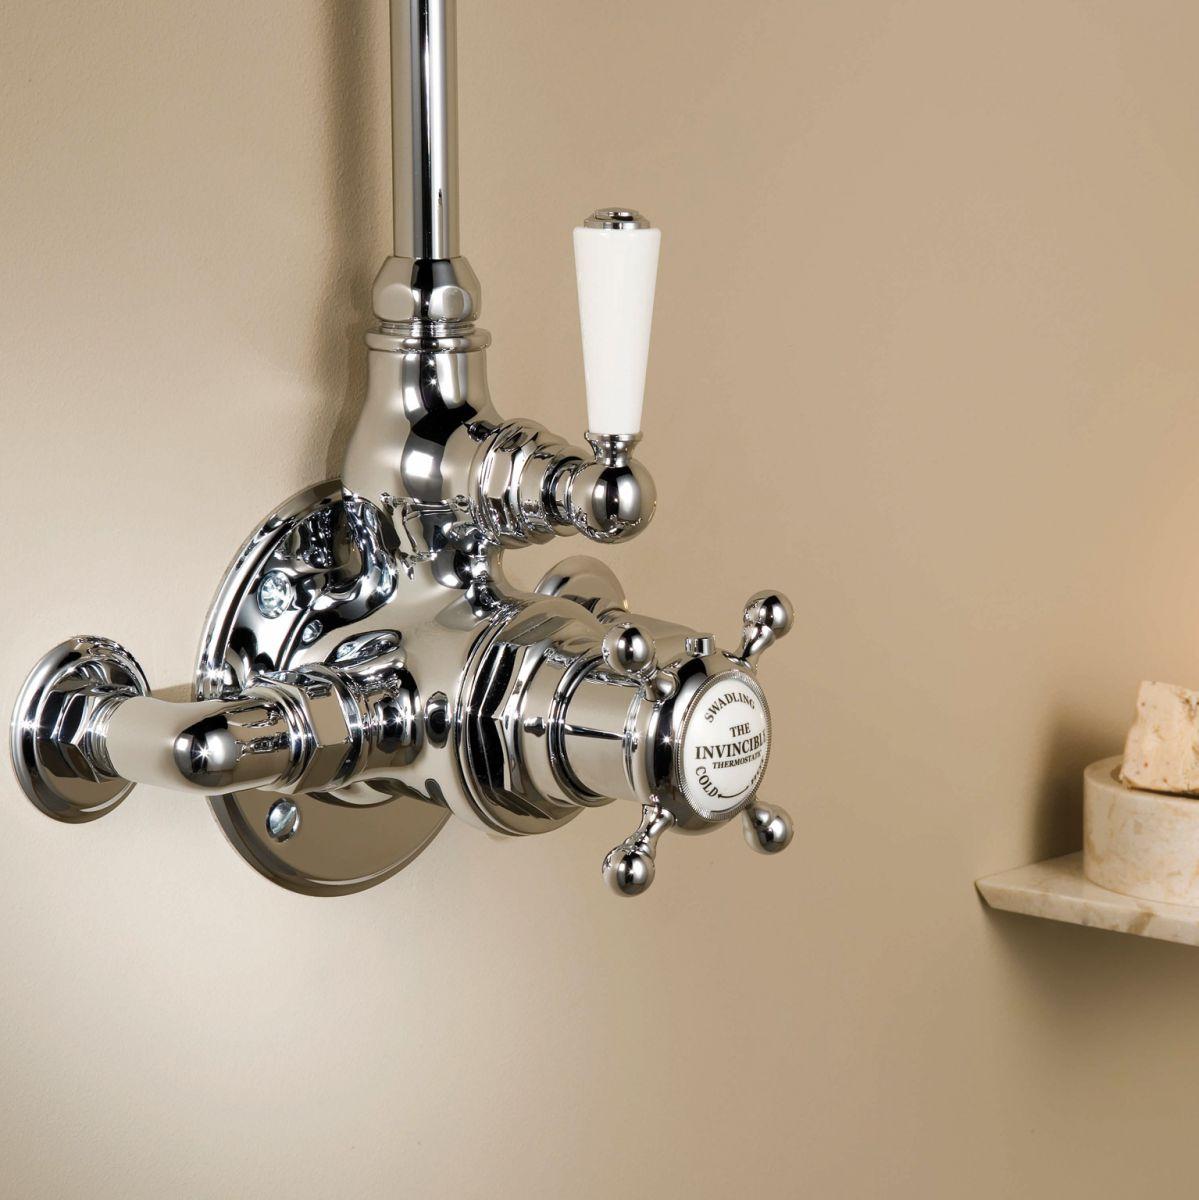 matki swadling invincible exposed thermostatic shower. Black Bedroom Furniture Sets. Home Design Ideas